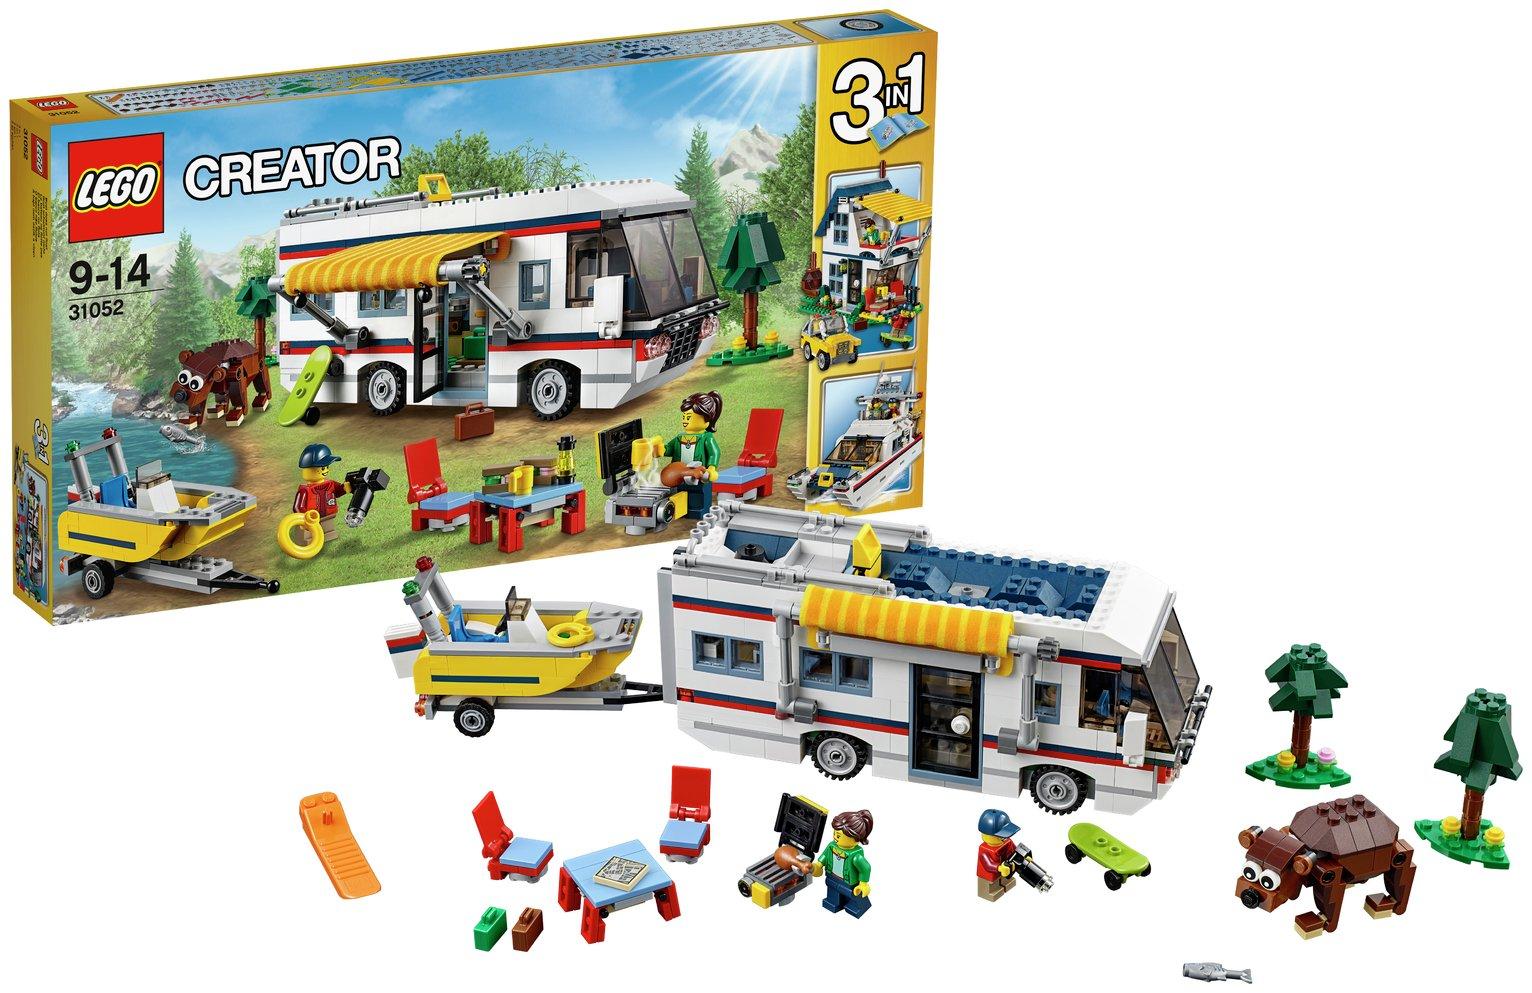 LEGO - Creator Vacation Getaways - 31052